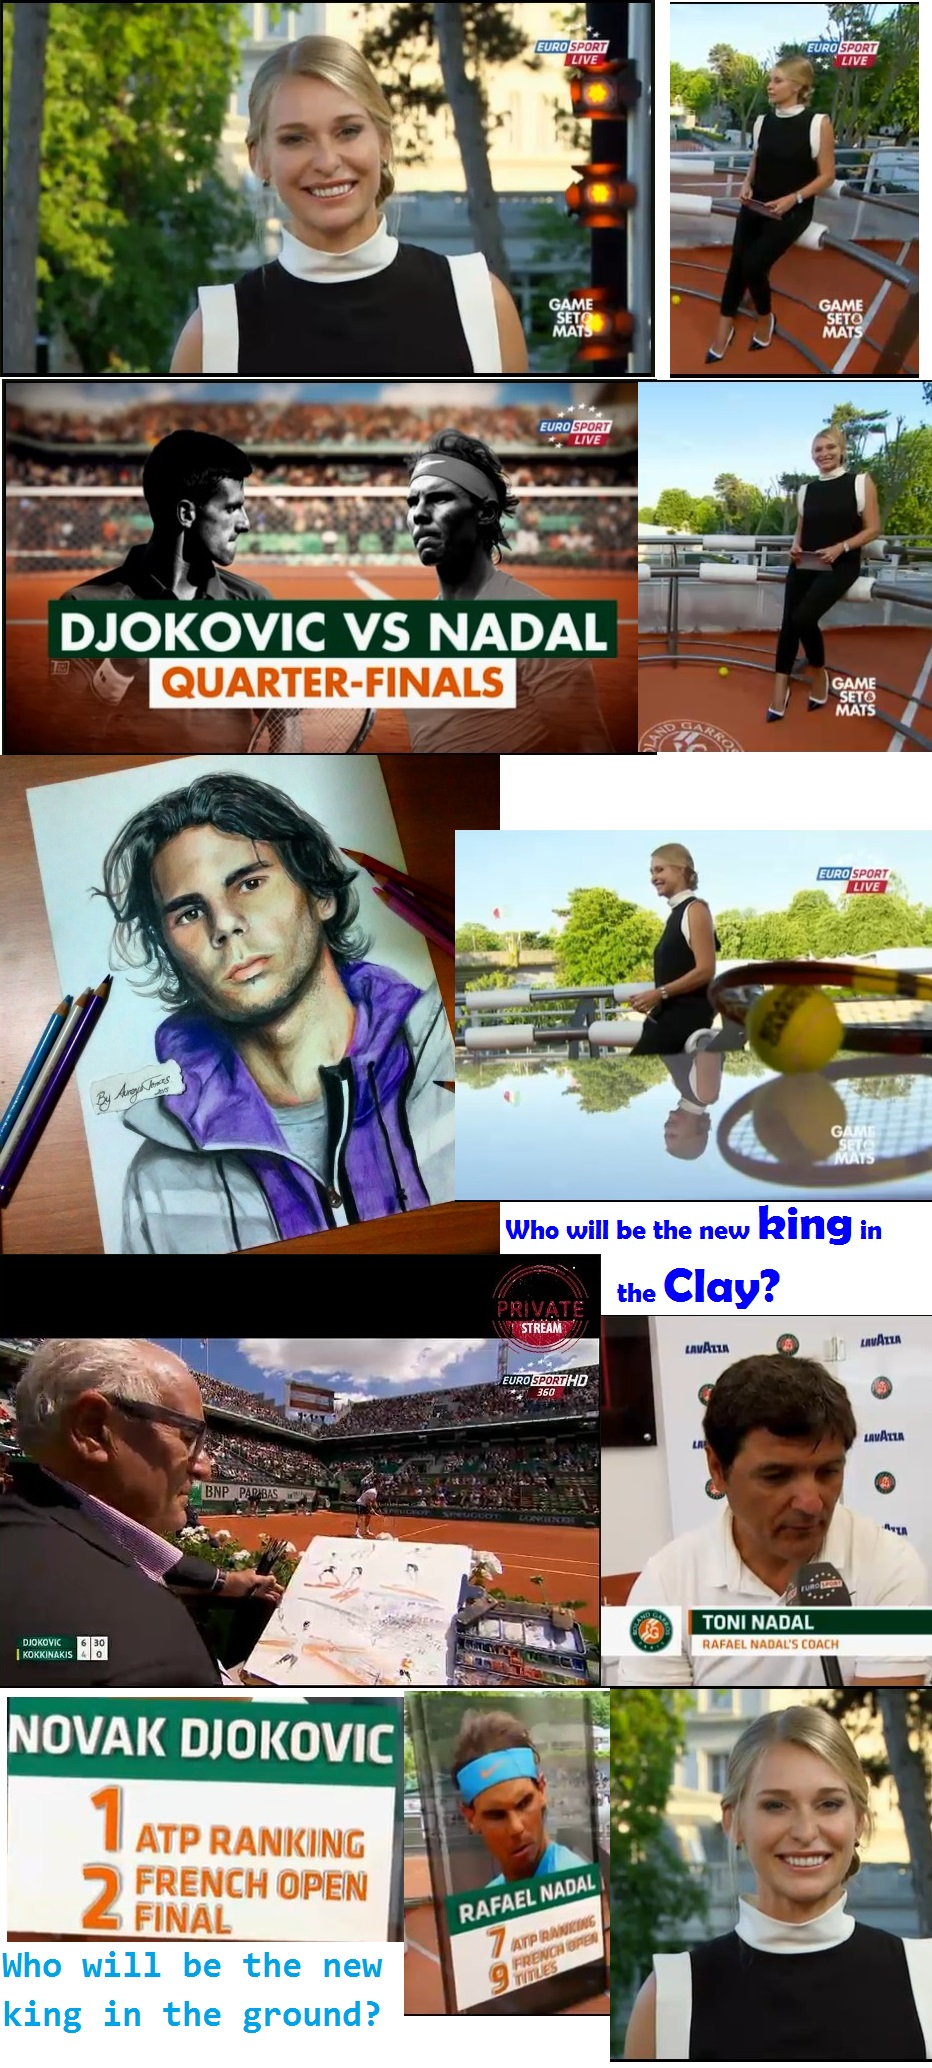 TENNIS GRAND SLAM ROLAND GARROS DJOKOVIC VS NADAL 01 030615